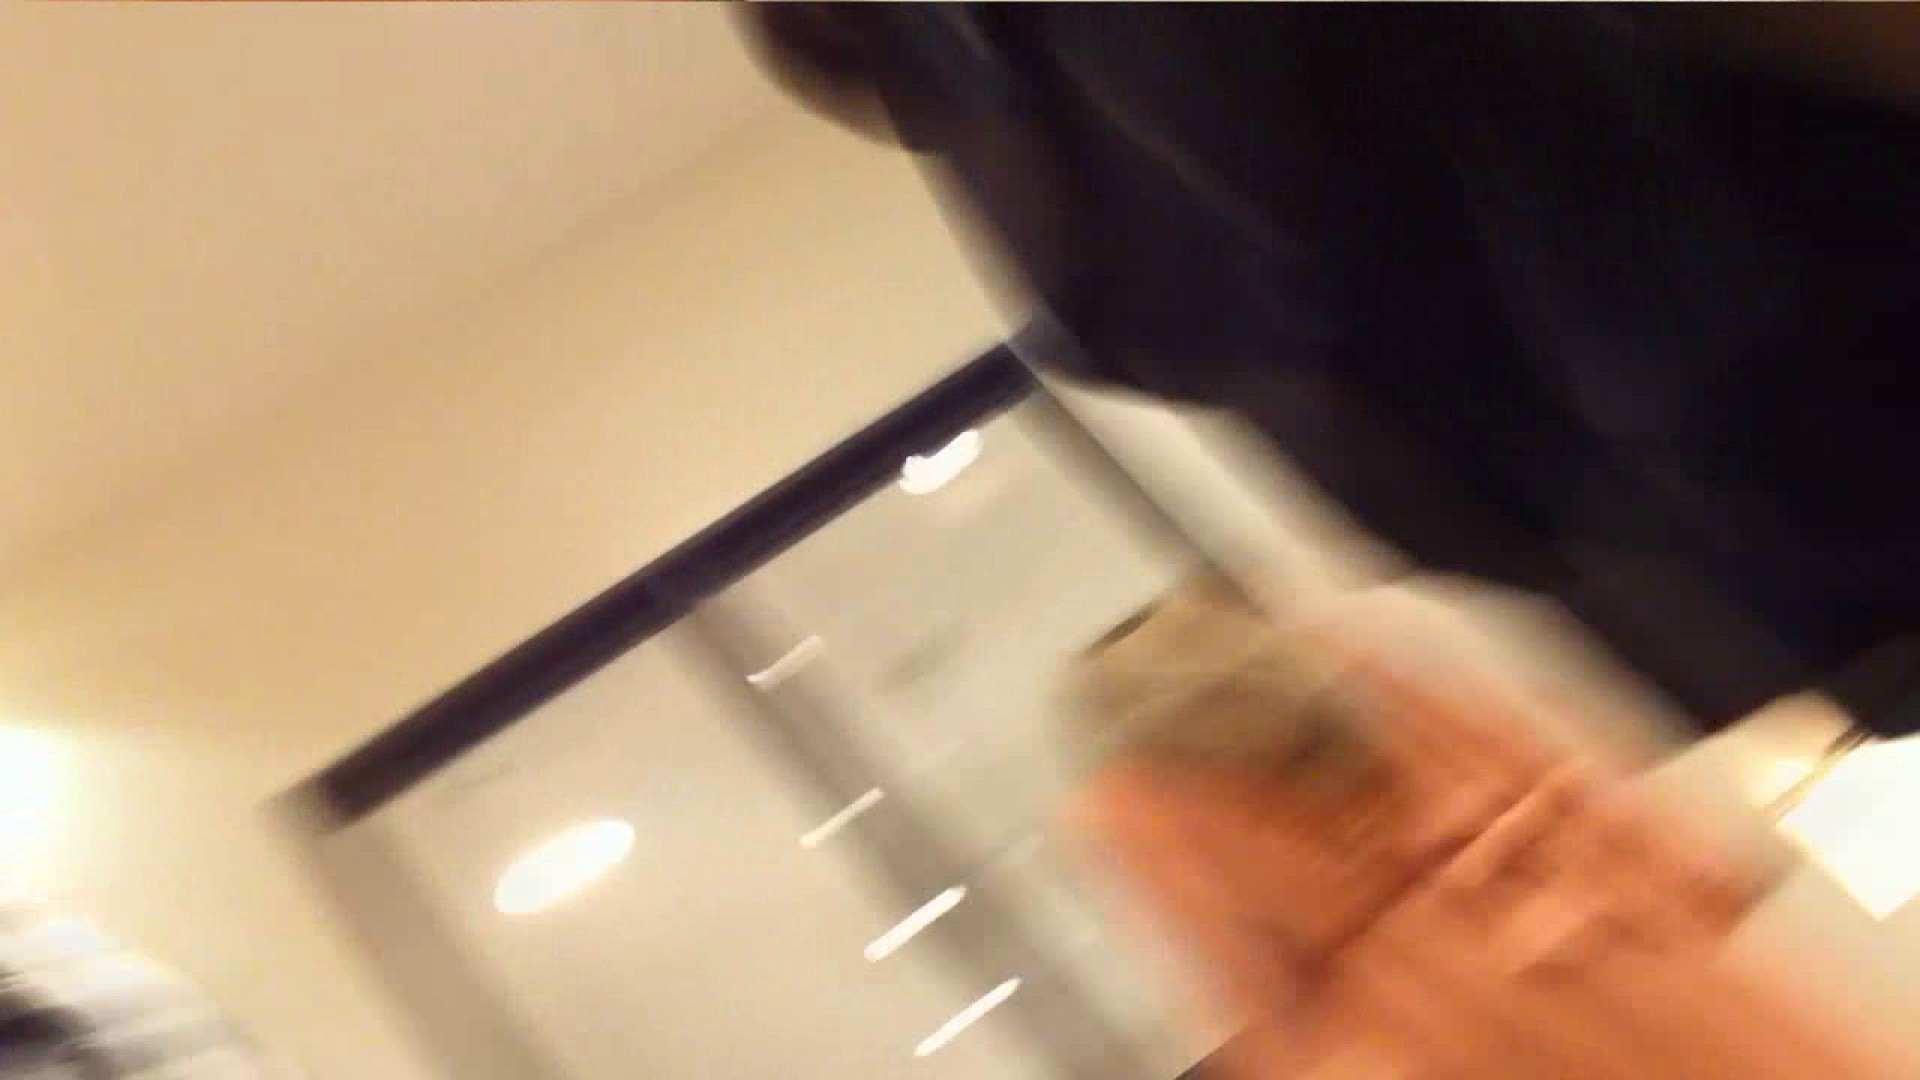 vol.36 美人アパレル胸チラ&パンチラ ポニテ(゚∀゚)キタコレ!! 接写 AV動画キャプチャ 90PIX 59